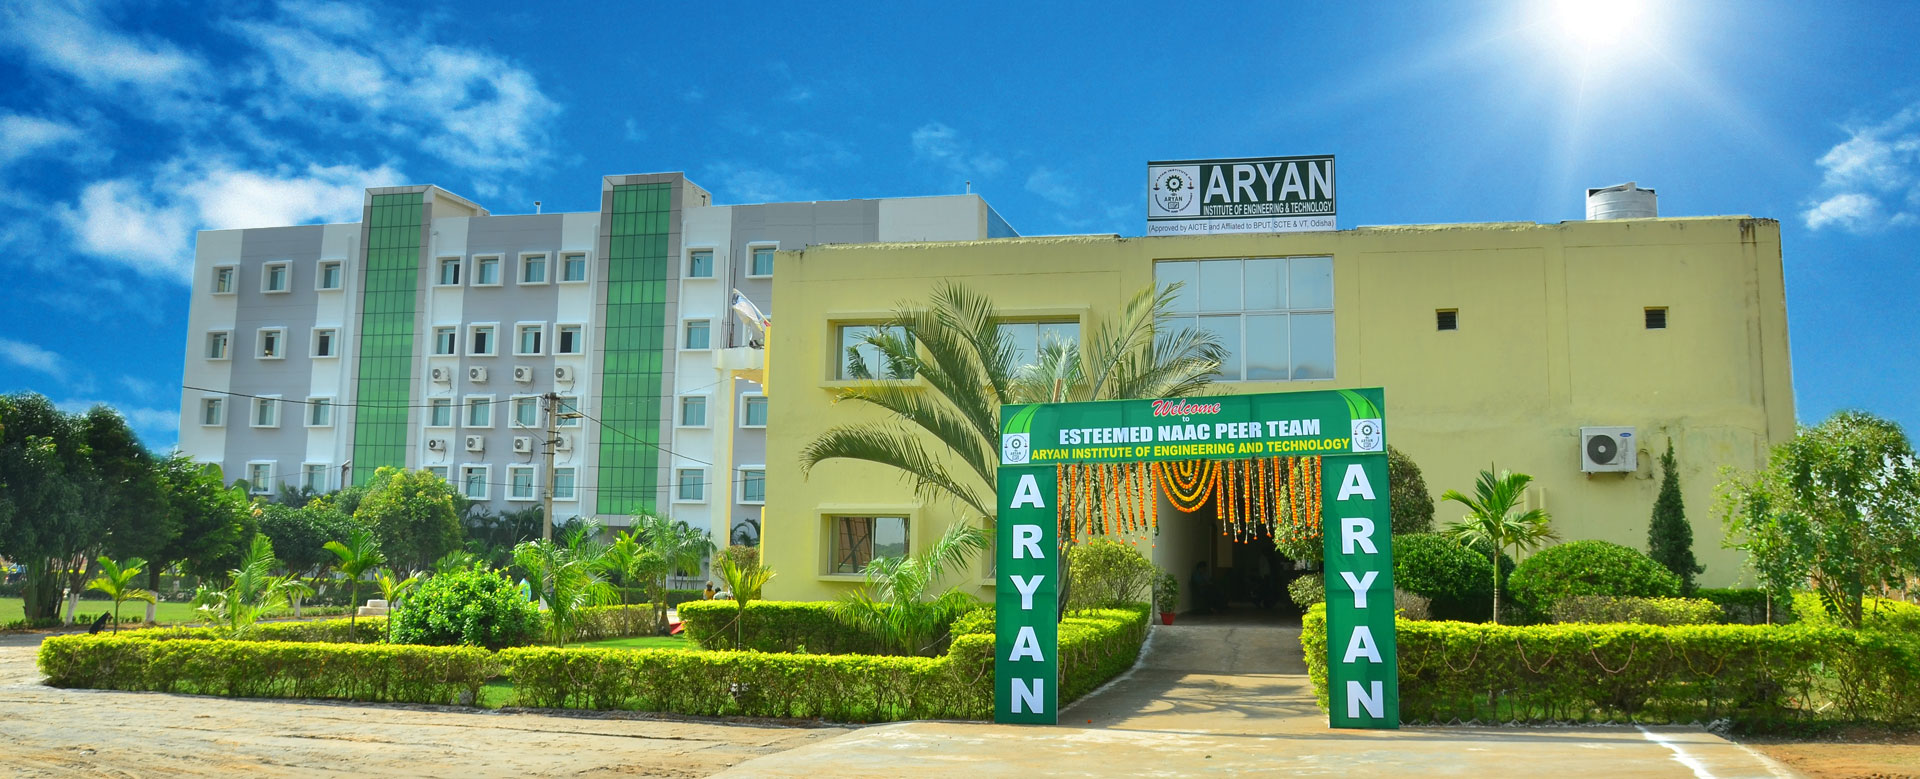 aryan banner